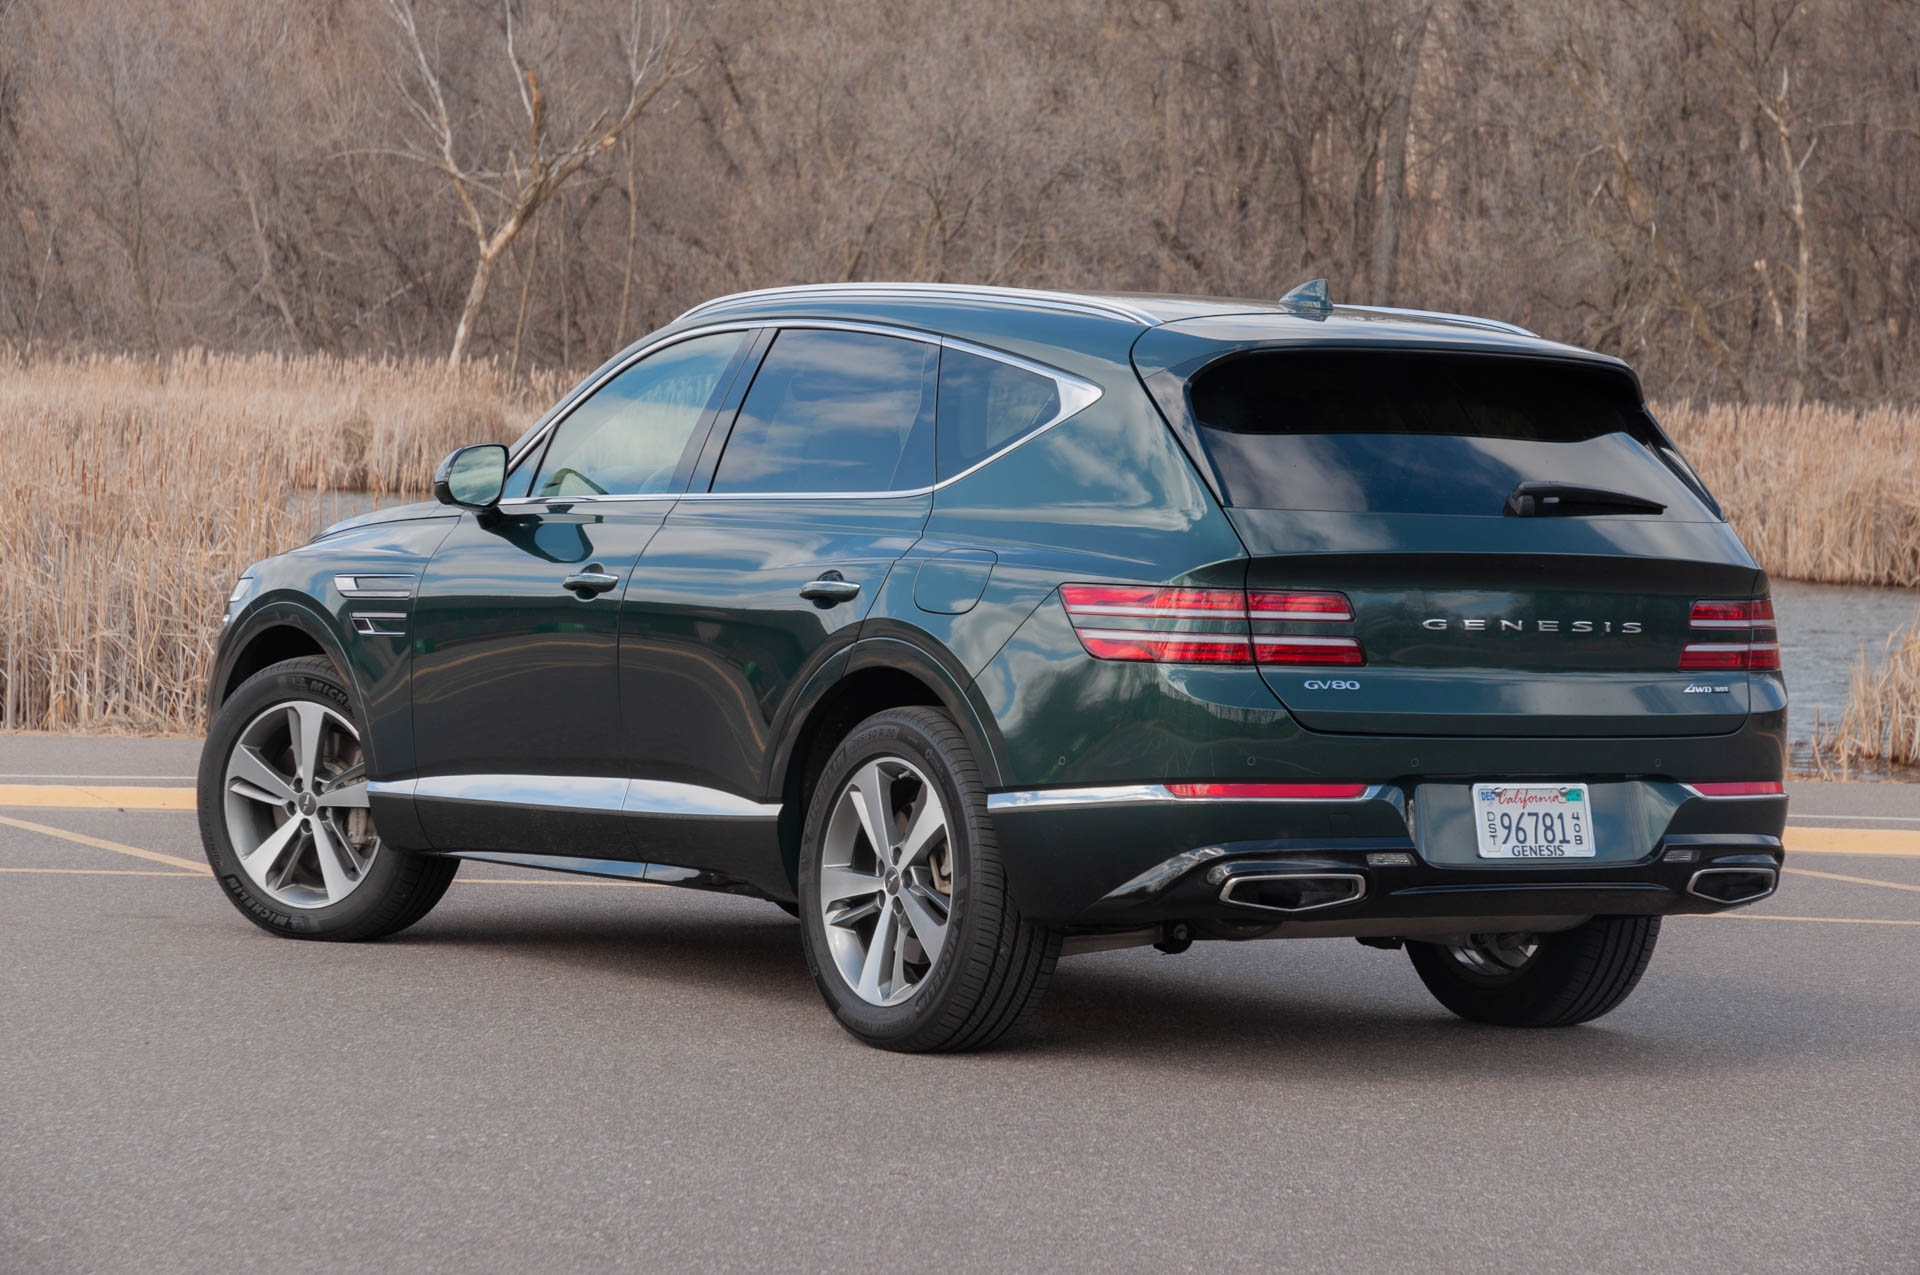 2021 Genesis GV80, 2021 Ford Bronco, 2023 Porsche Cayenne: Today's Car News